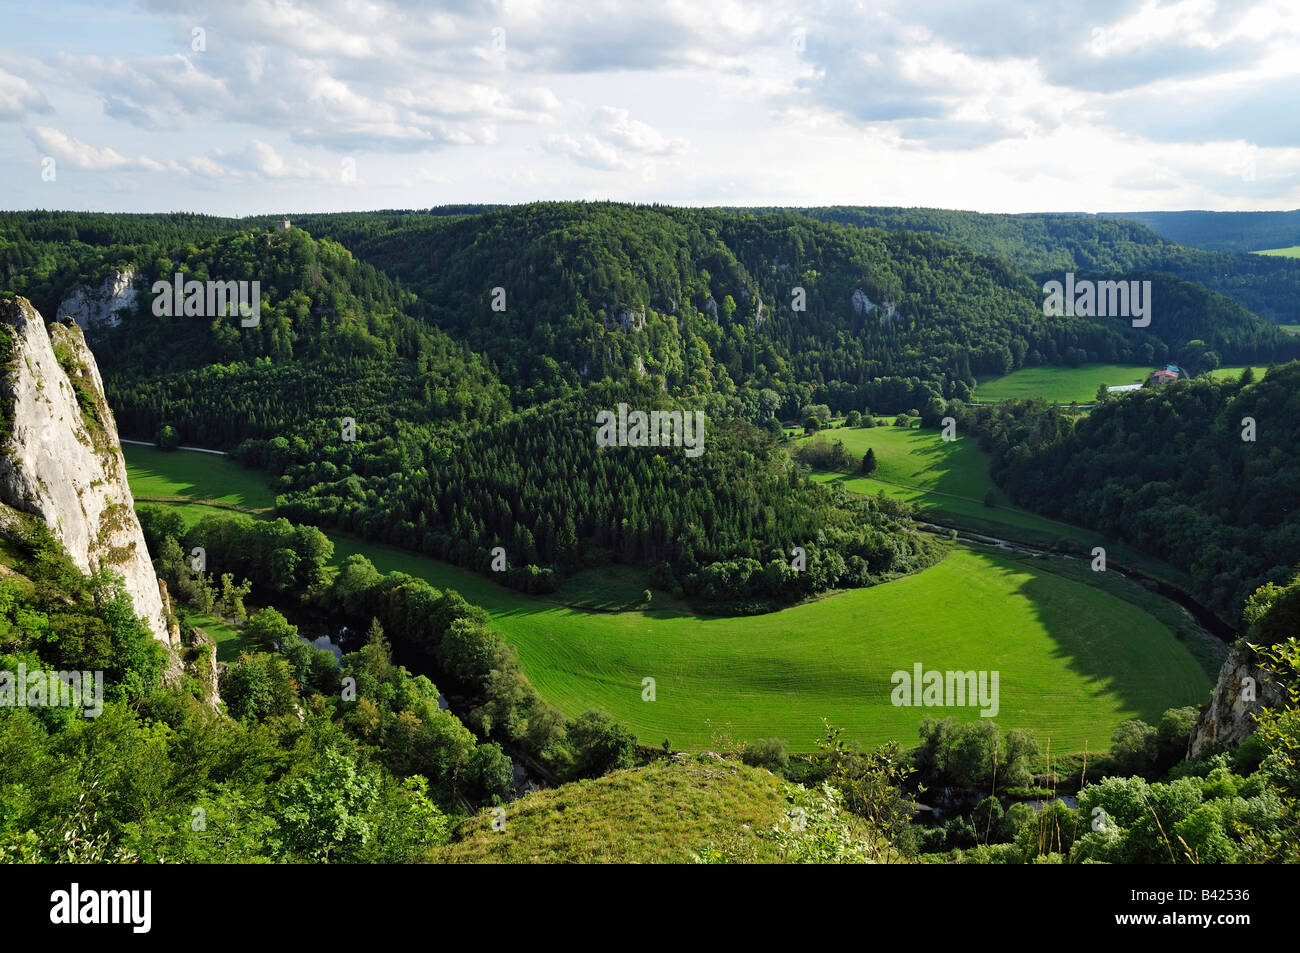 Donautal (Danube valley), Naturpark (natural park) Obere Donau, Schwäbische Alb, Donaubergland, Baden-Württemberg, Stock Photo